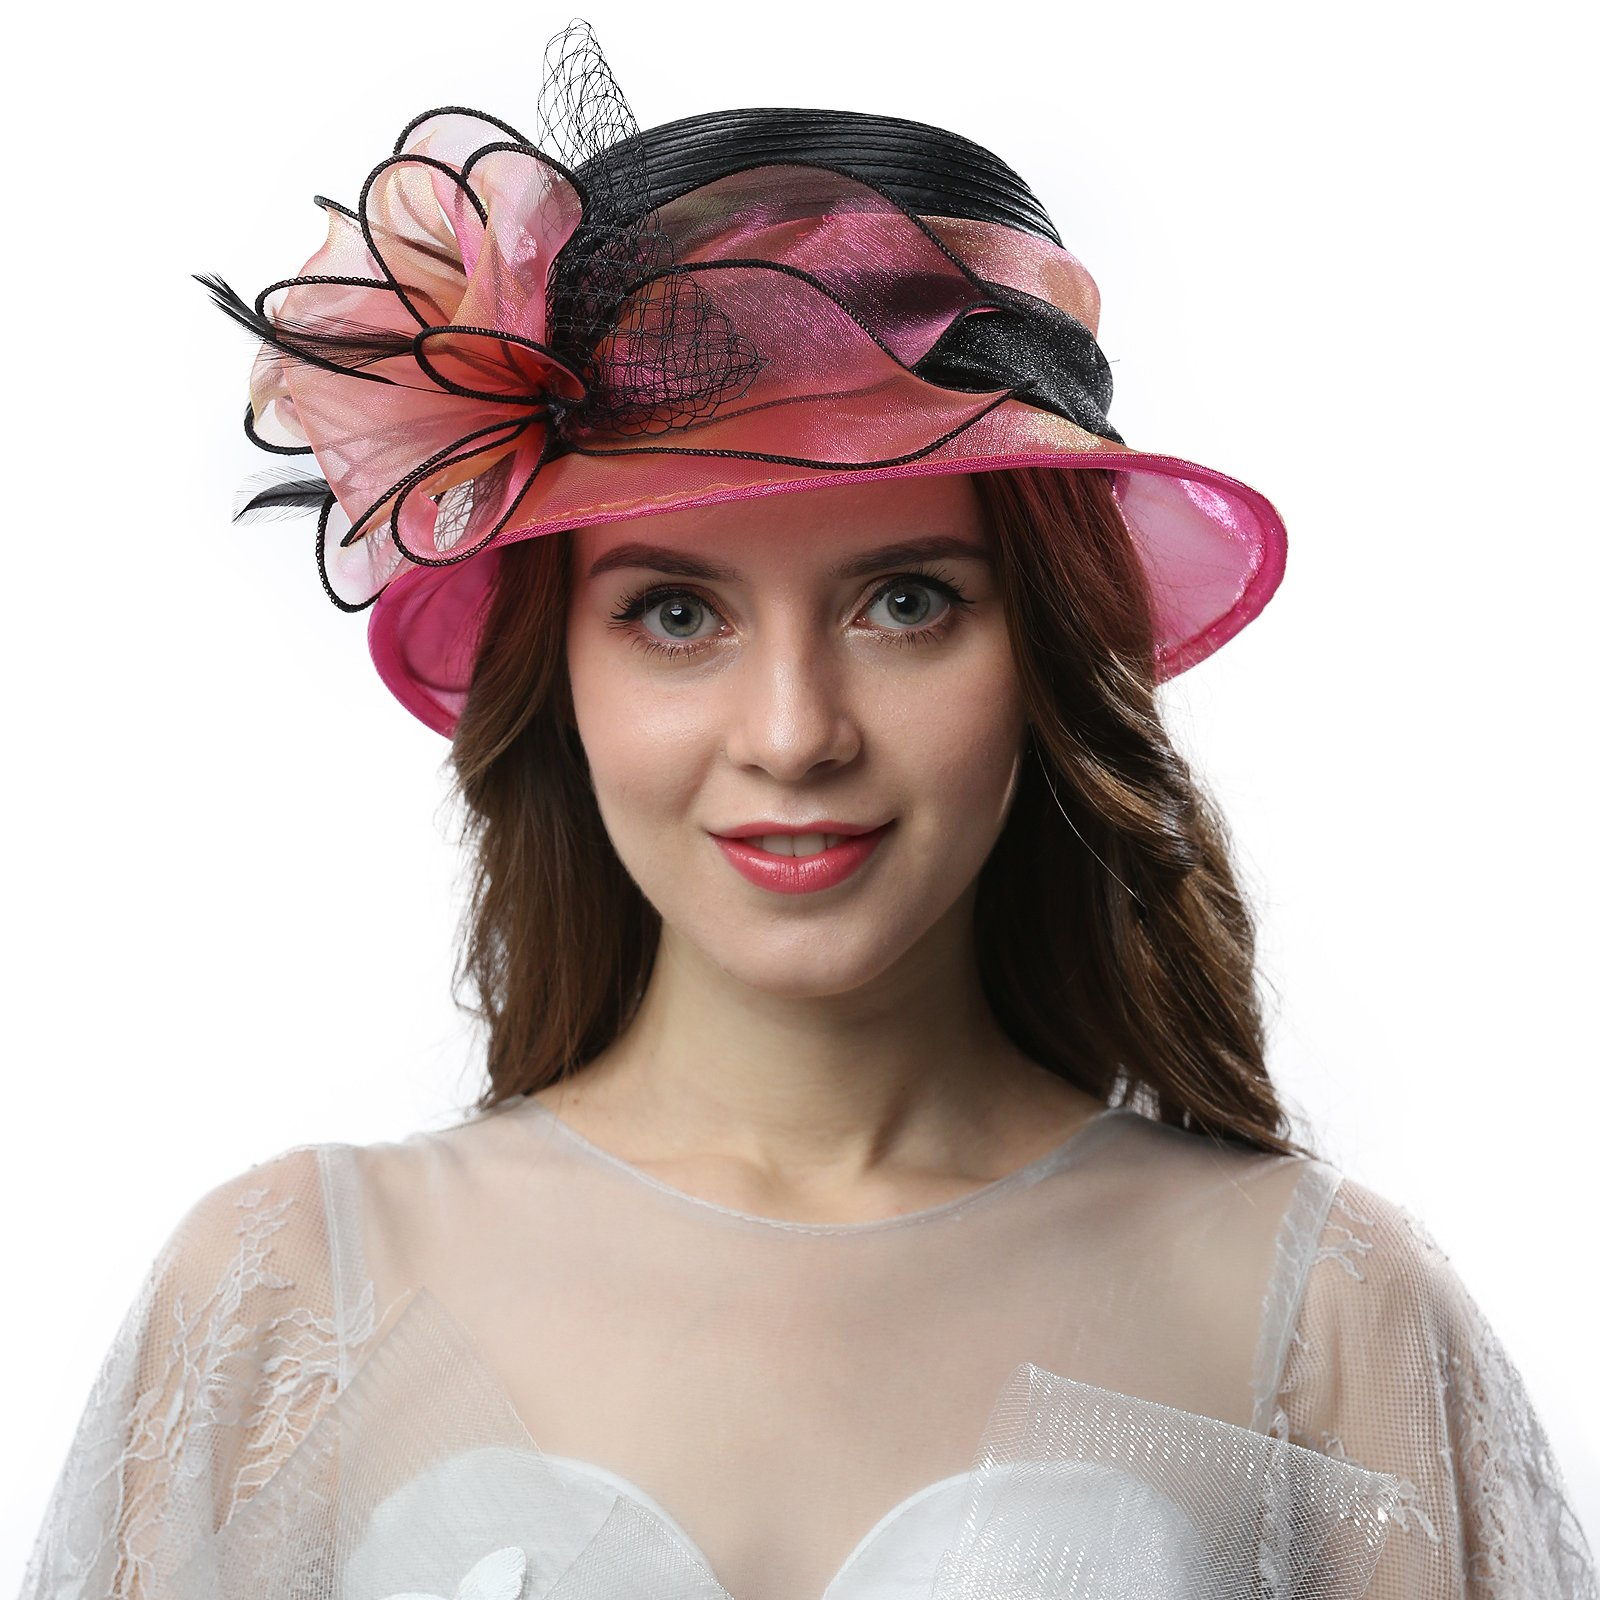 Janey&Rubbins Women Kentucky Derby Church Wedding Fascinators Cloche Bucket Bowler Hat (Fuschia/Black)